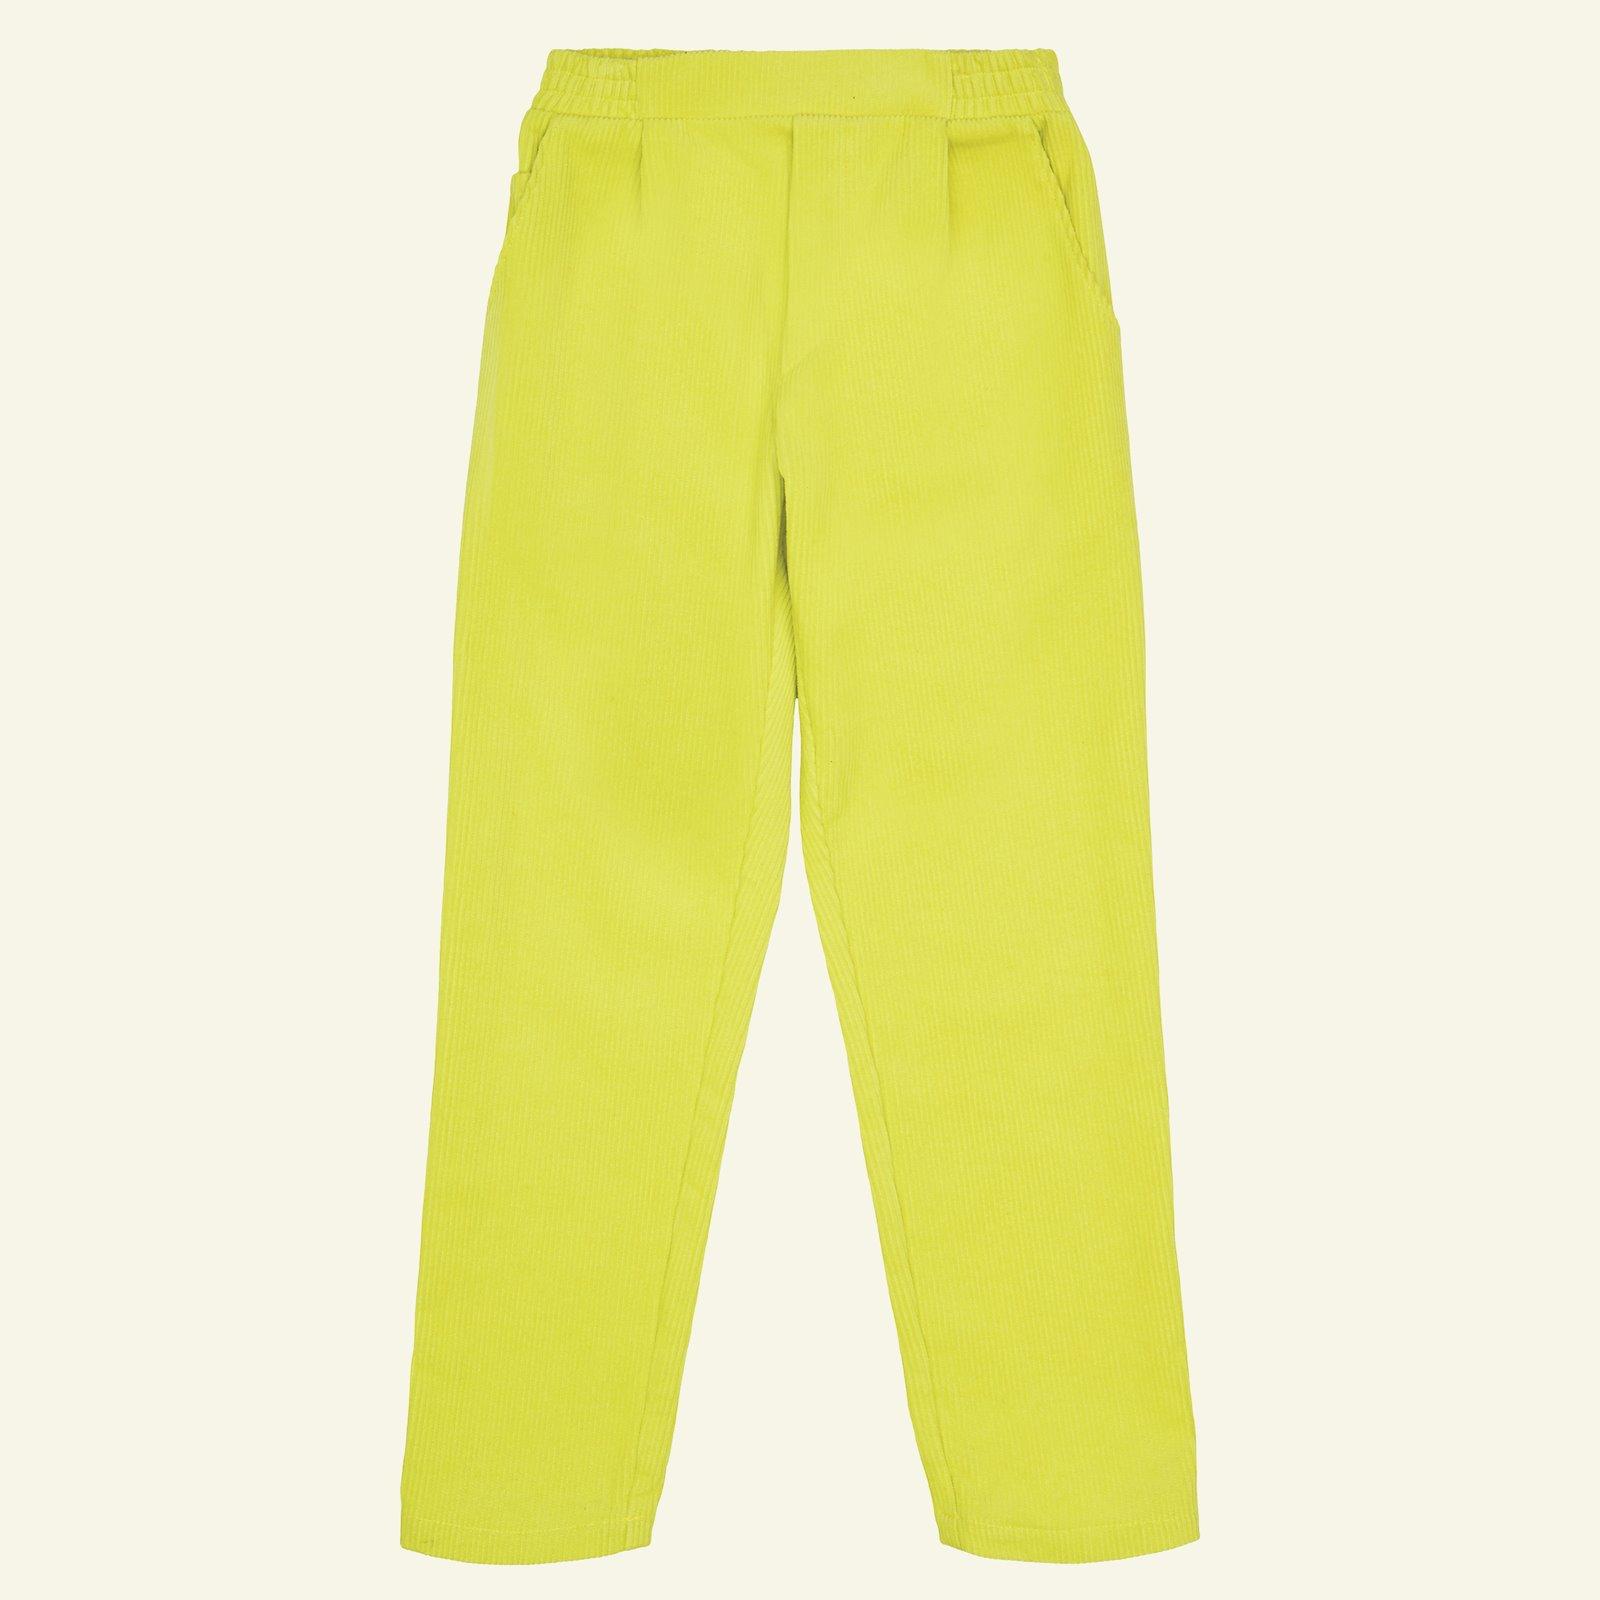 Chino pants, 116/6y p60033_430822_sskit